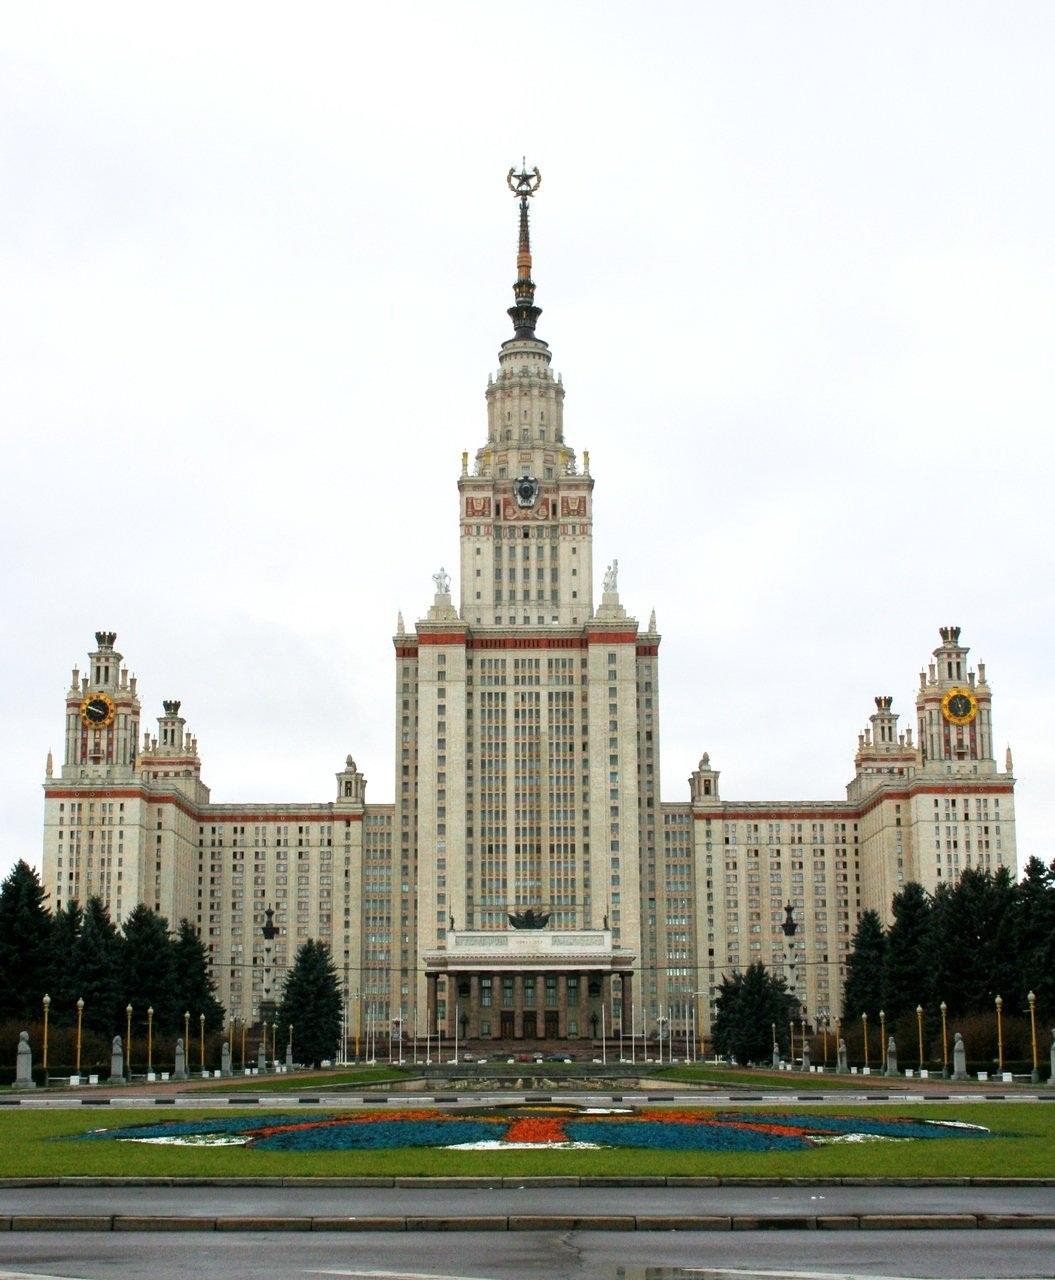 https://img-fotki.yandex.ru/get/5644/137106206.288/0_ae169_247dd907_orig.jpg